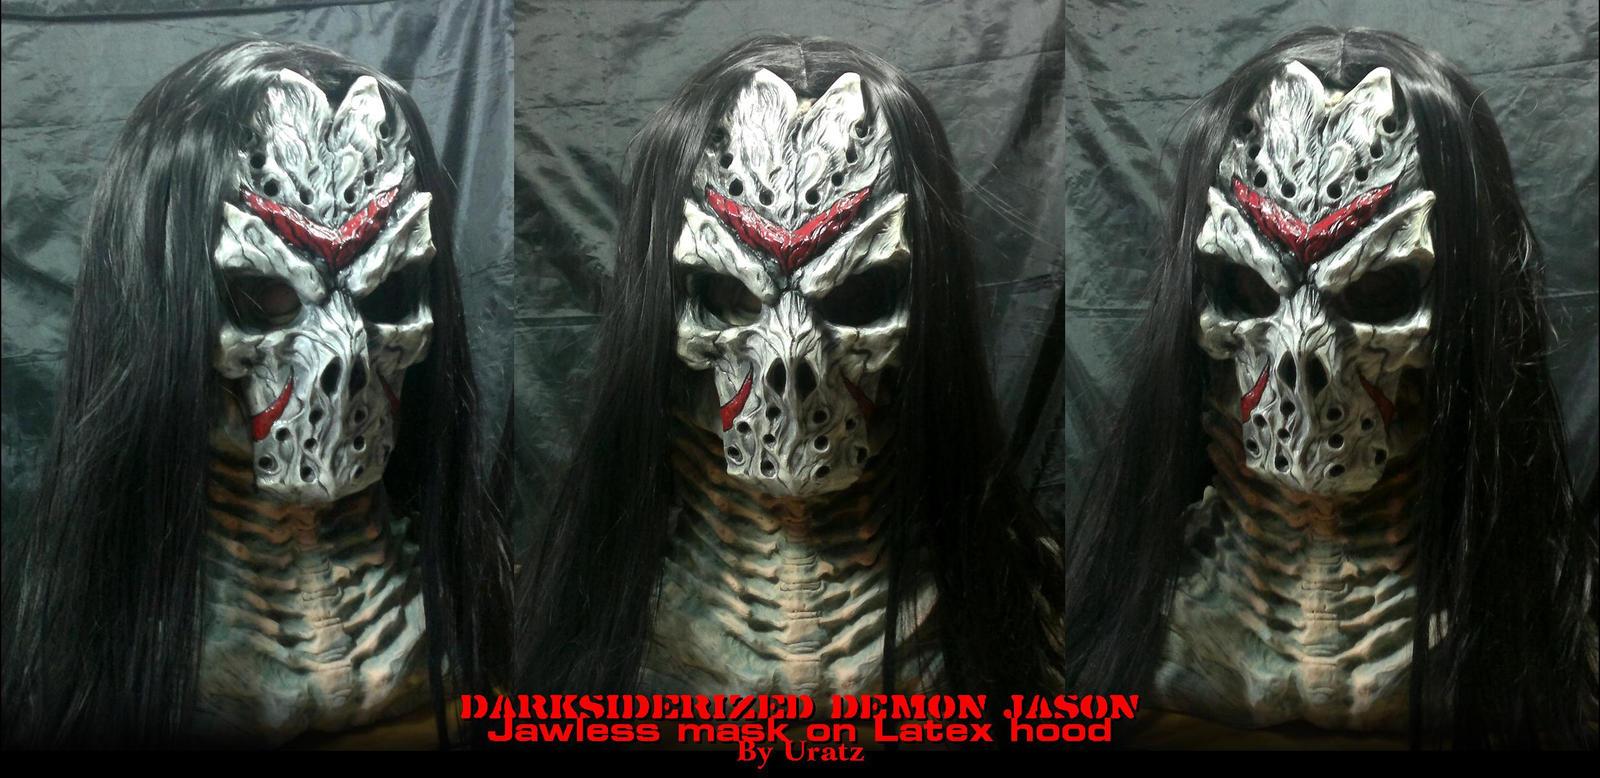 Darksiderized demon jason hood by uratz studios on deviantart - Uratz studios ...